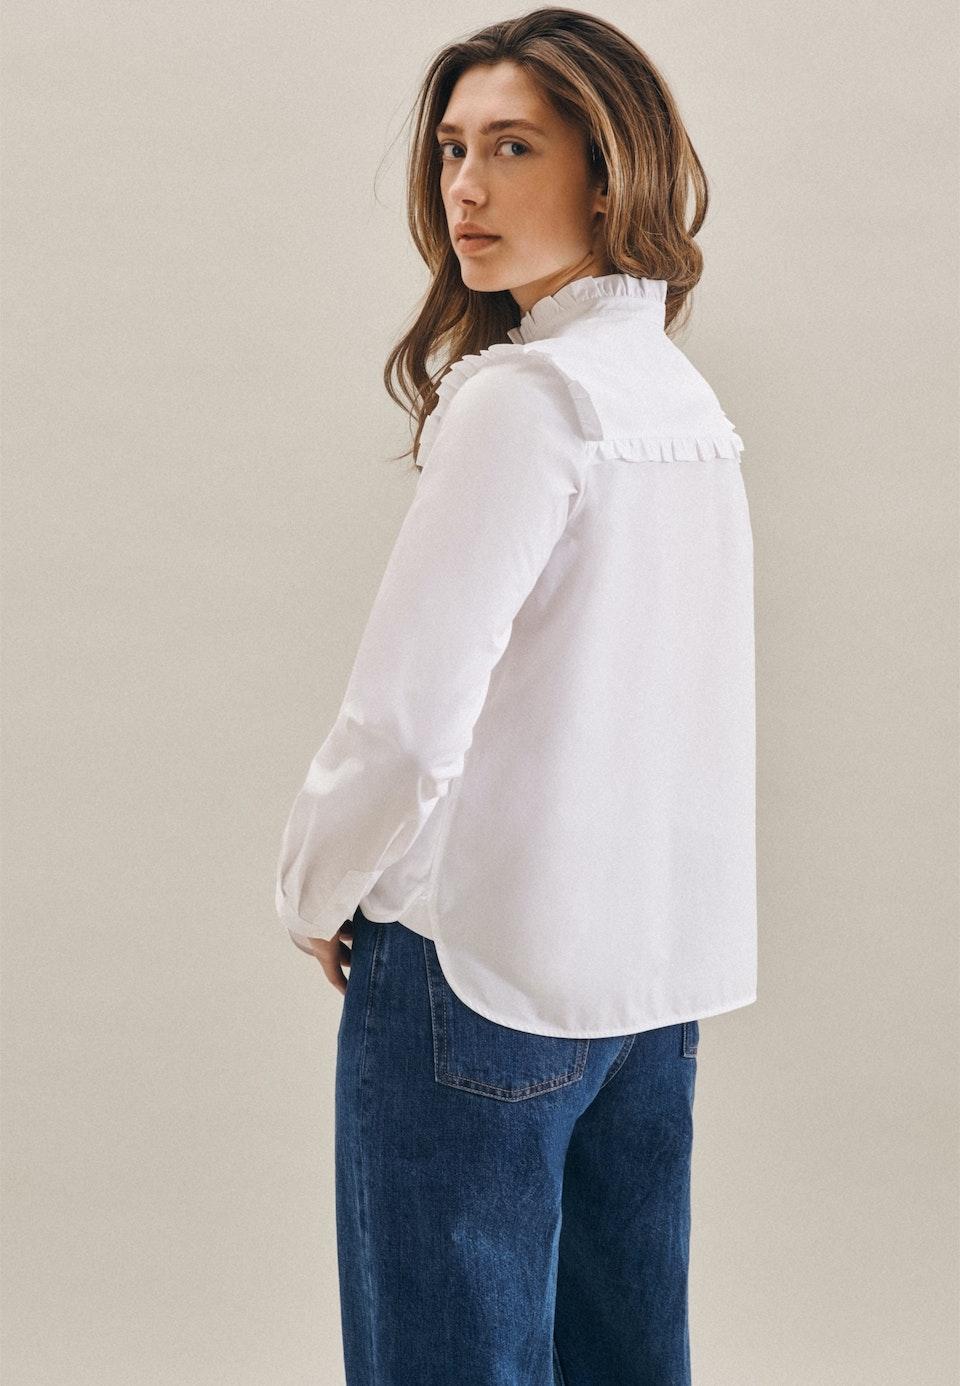 Popeline Stand-Up Blouse made of 100% Cotton in White |  Seidensticker Onlineshop